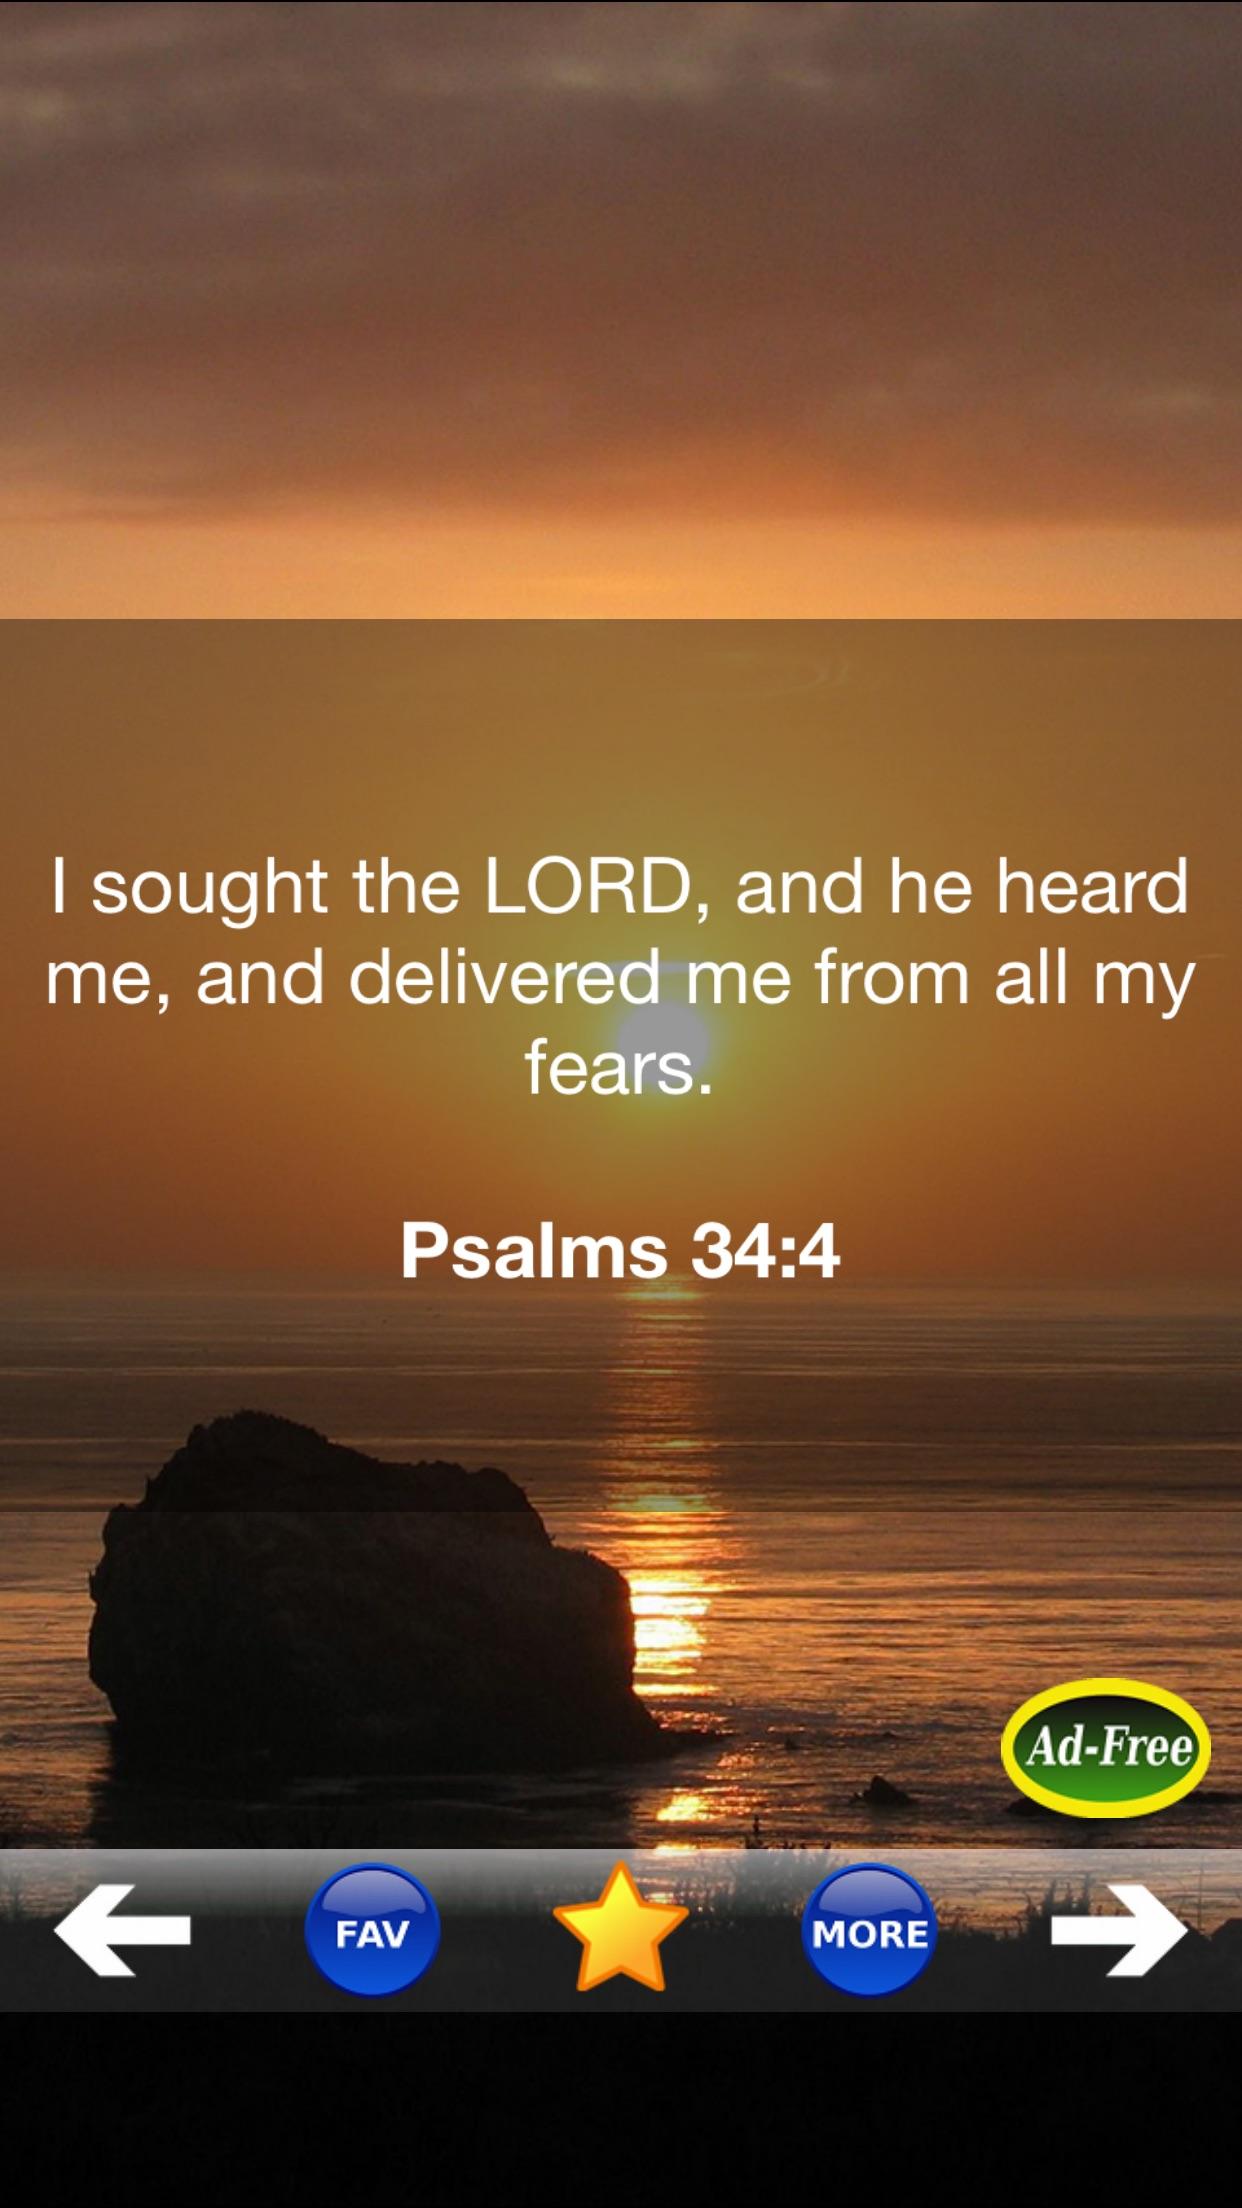 Inspirational Bible Verse of the Day FREE! Daily Bible Inspirations, Scripture & Christian Devotionals! Screenshot